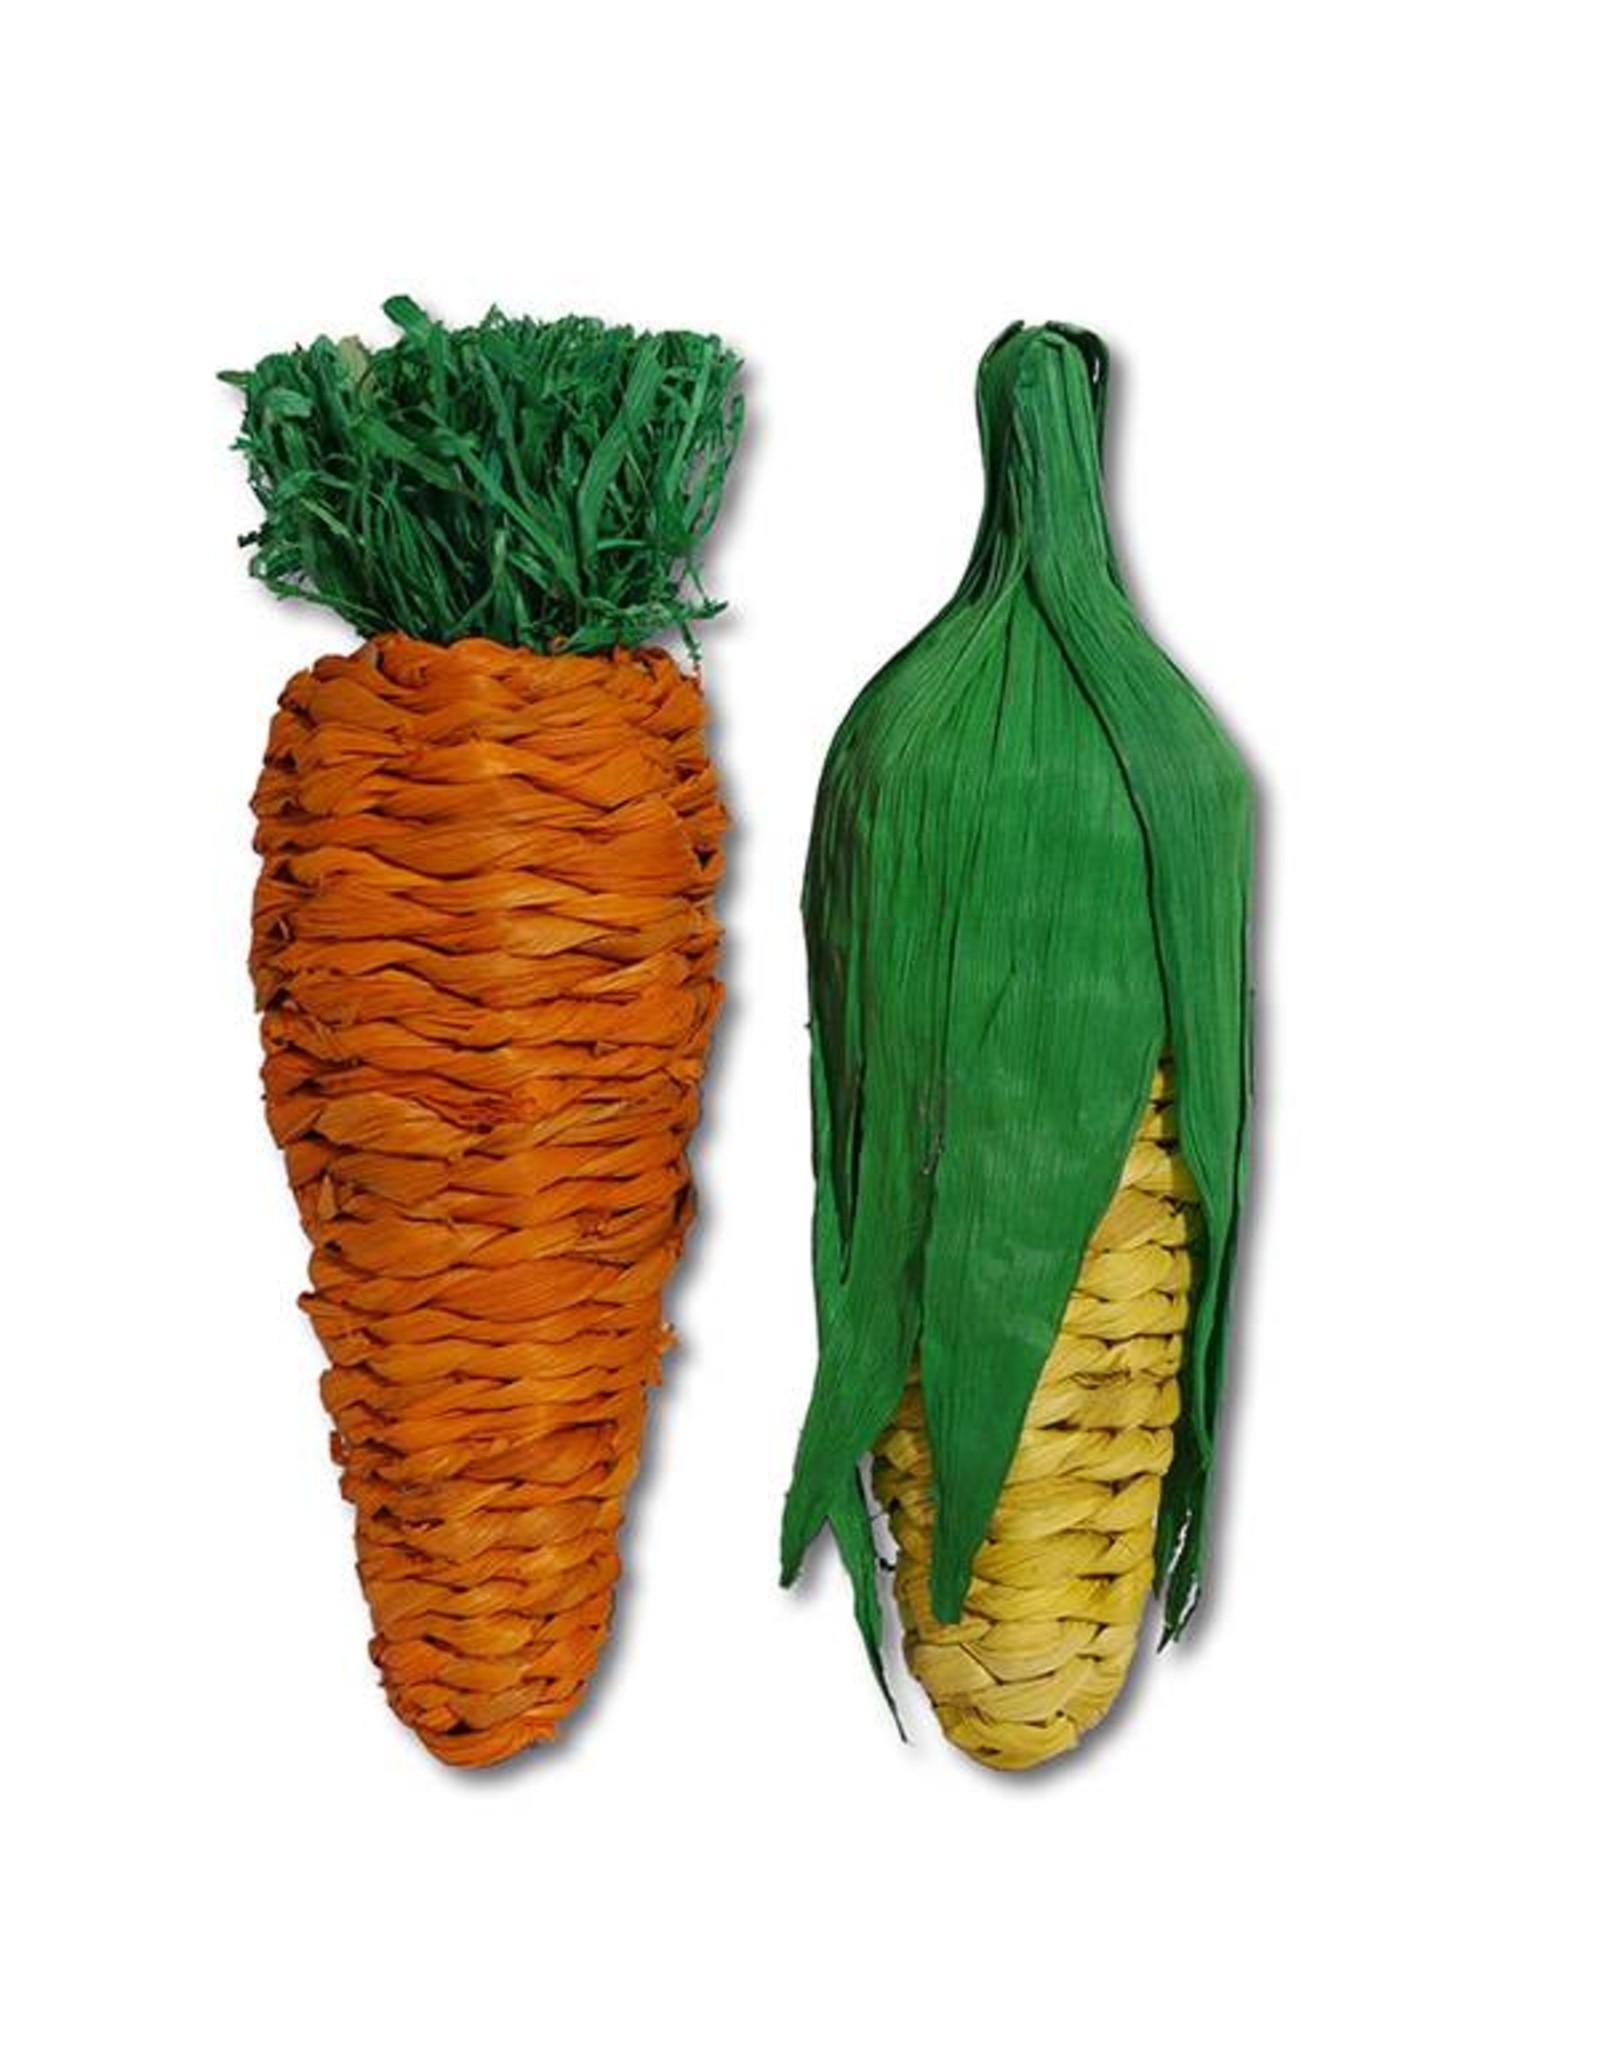 Rosewood Boredom Breaker Jumbo Small Animal Play Veg Carrot & Corn Chew Toy